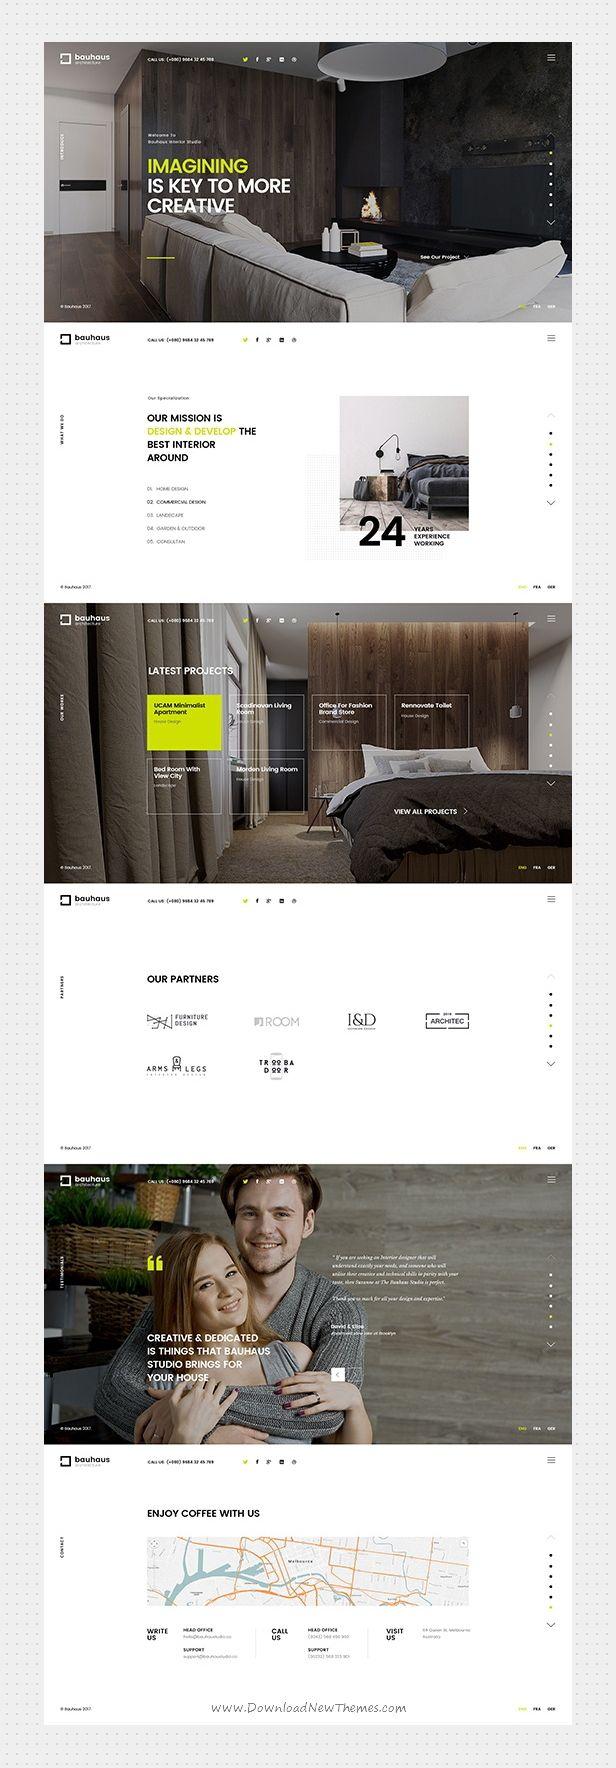 Bauhaus Architecture Interior Template In 2020 Web Design Tips Bauhaus Architecture Web Layout Design